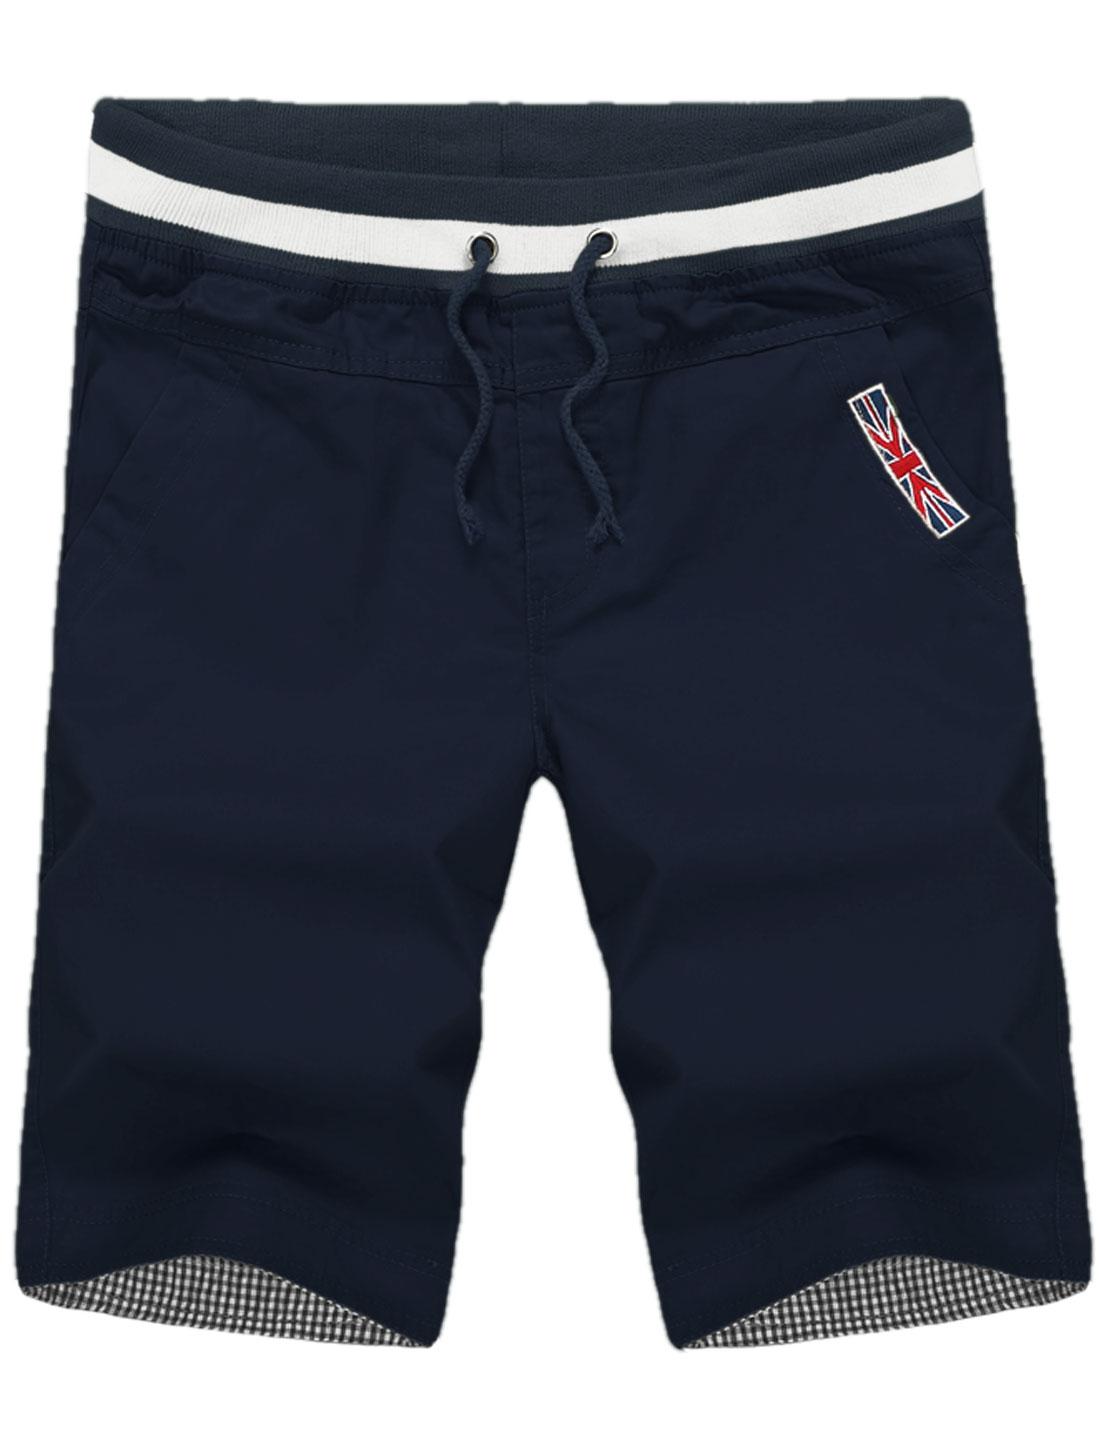 Men Front Slant Pockets Rib Knit Detail Summer Fit Capris Navy Blue W36